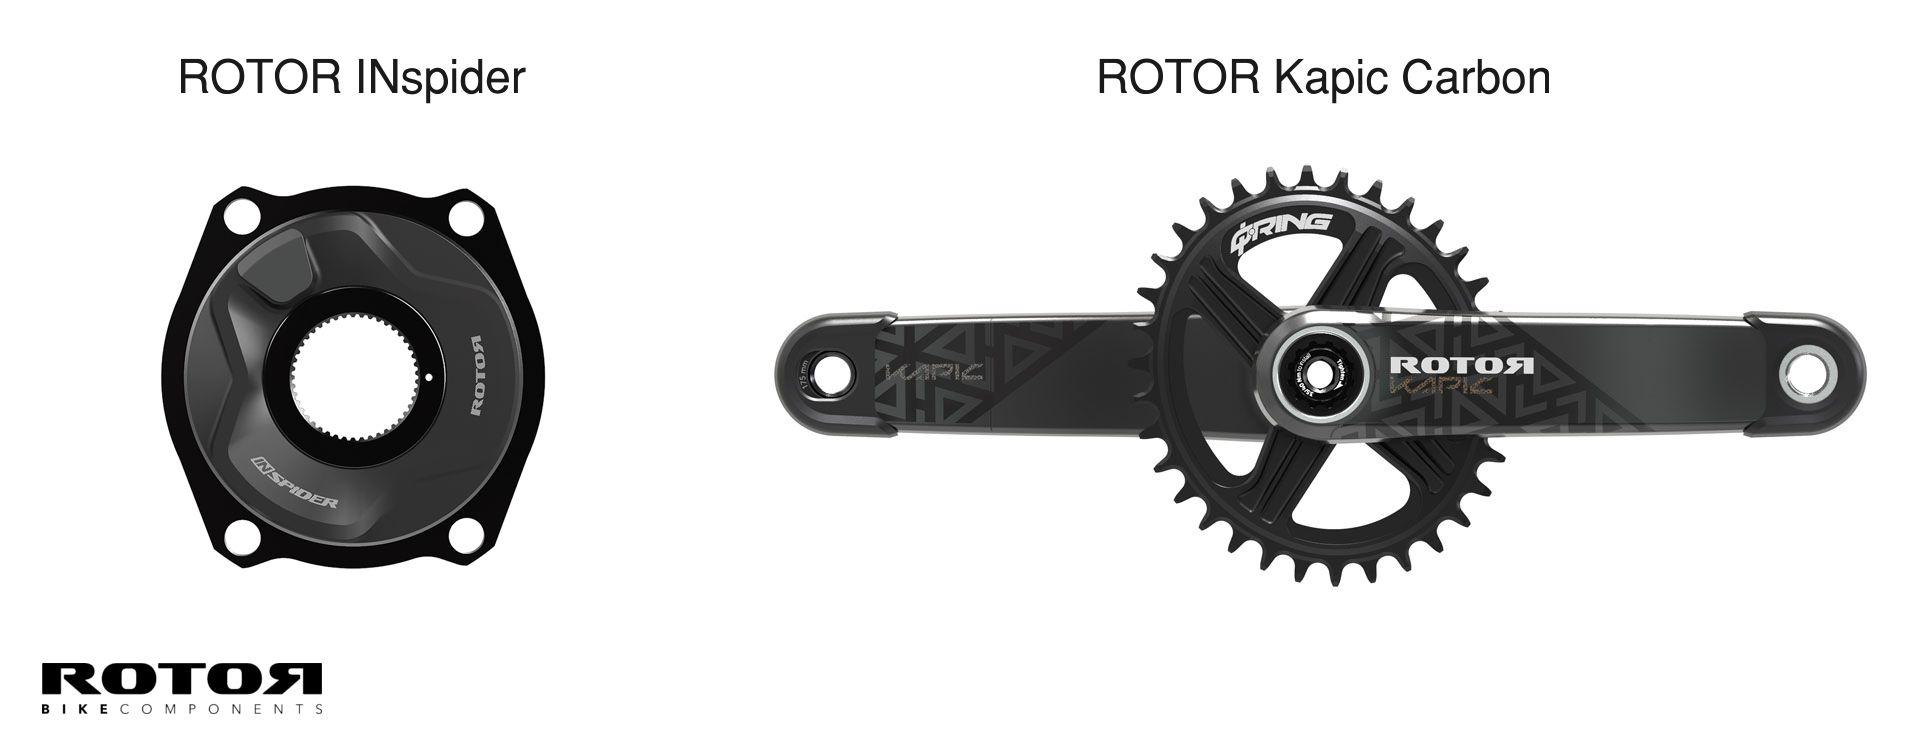 ROTOR INspider Powermeter und Kapic Carbon